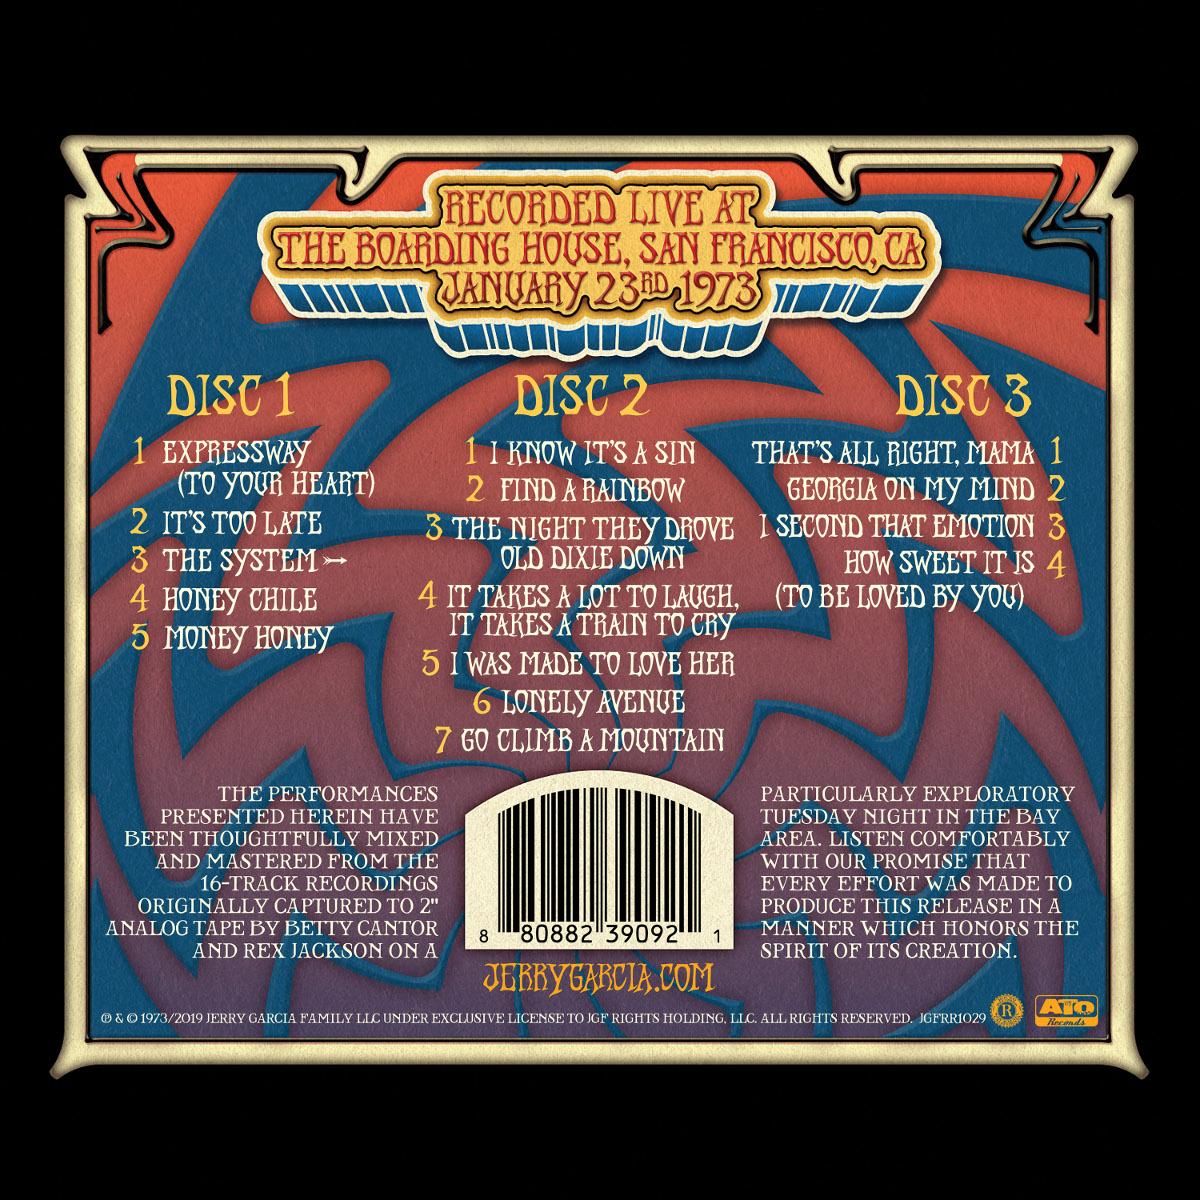 Jerry Garcia & Merl Saunders – GarciaLive Volume 12: 01/23/73 CD or Download & Organic T-Shirt Bundle